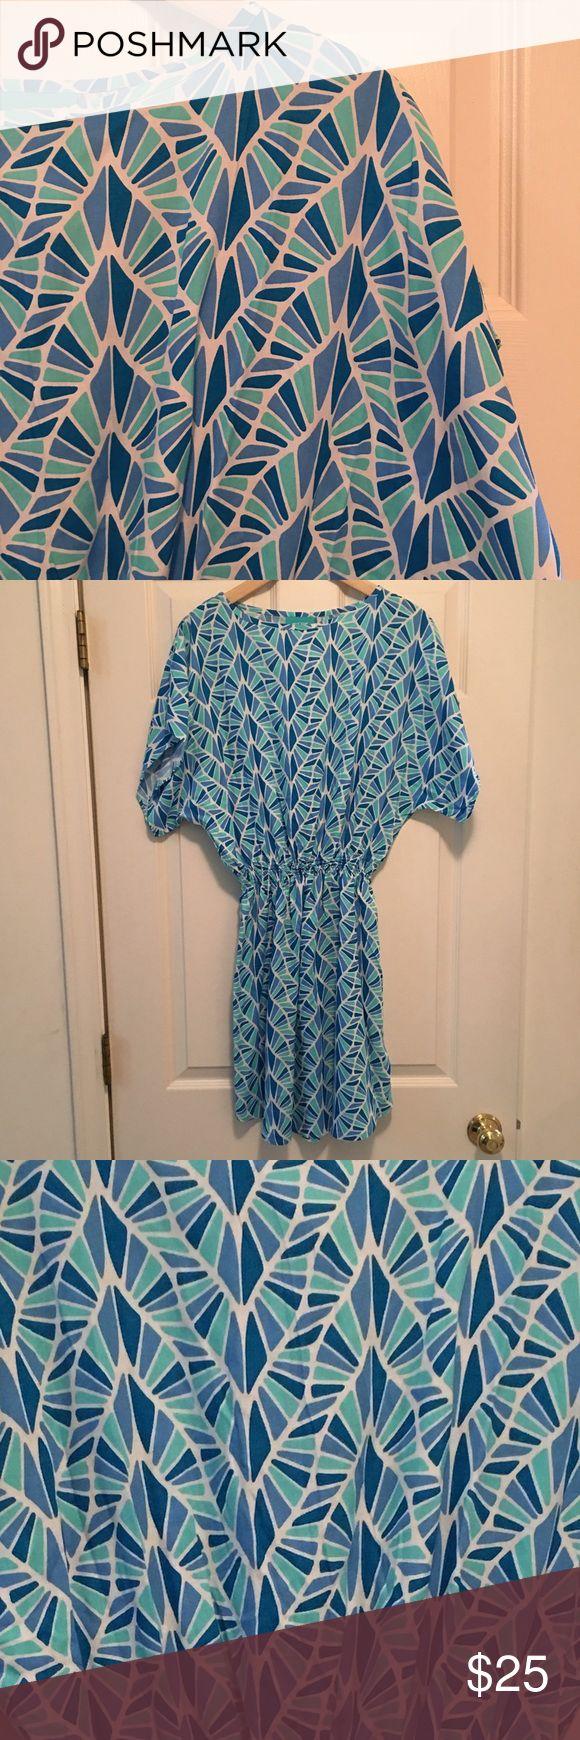 Escapada Resort Dress Resort living style, Poshmark pricing. Shades of blue in a geometric pattern, 100% rayon, xs. Escapada Dresses Midi